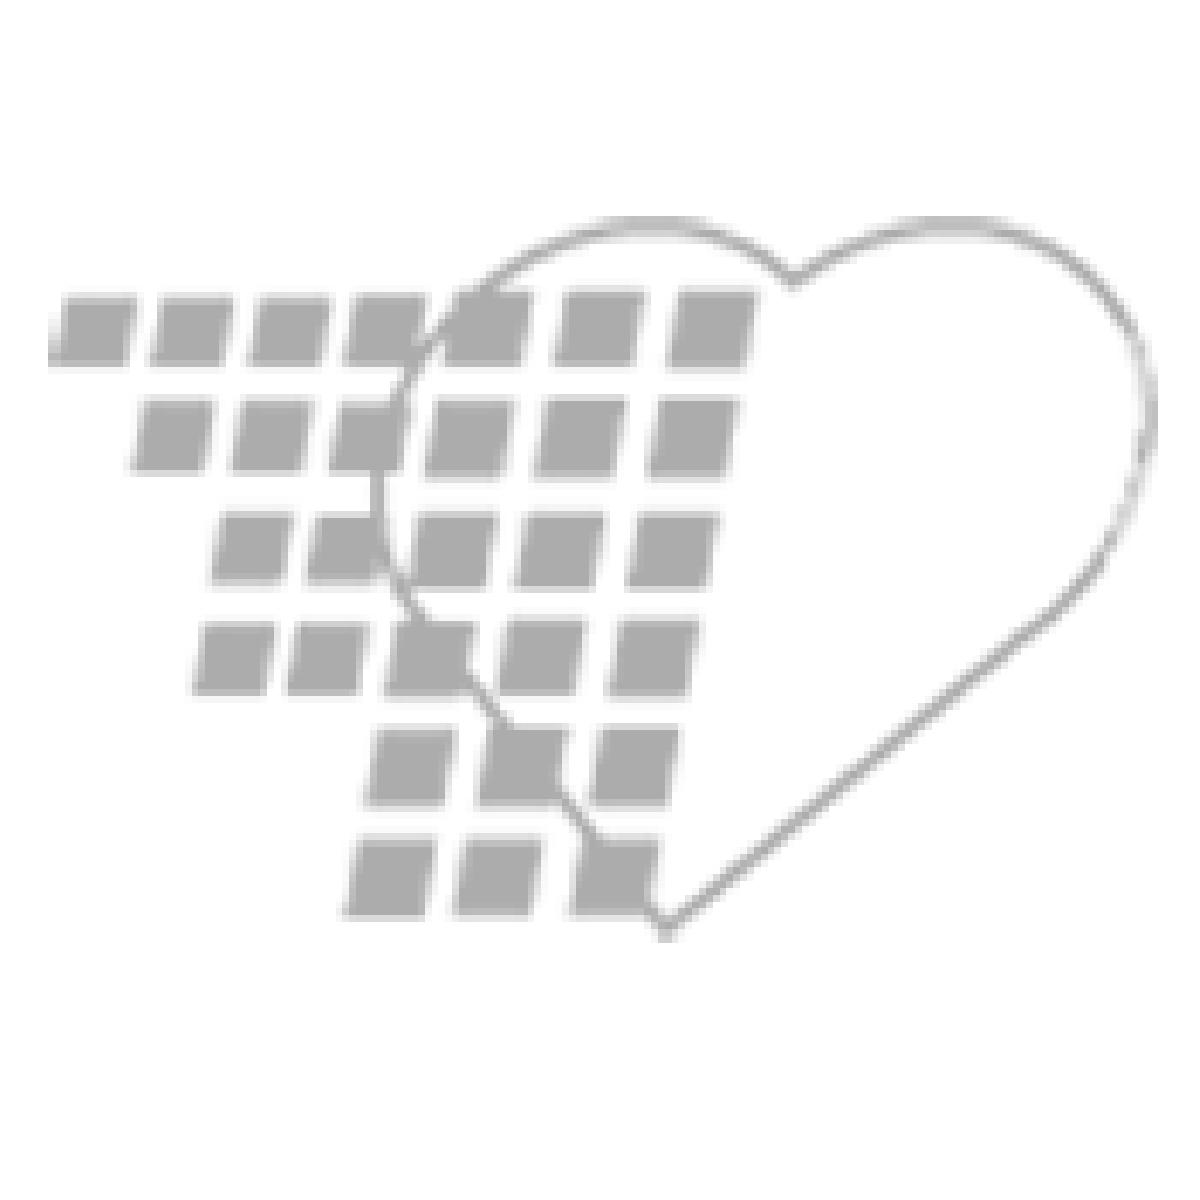 05-51-9431 Pocket Nurse® Dressing Change Tray Instruments & ABD™ Pad